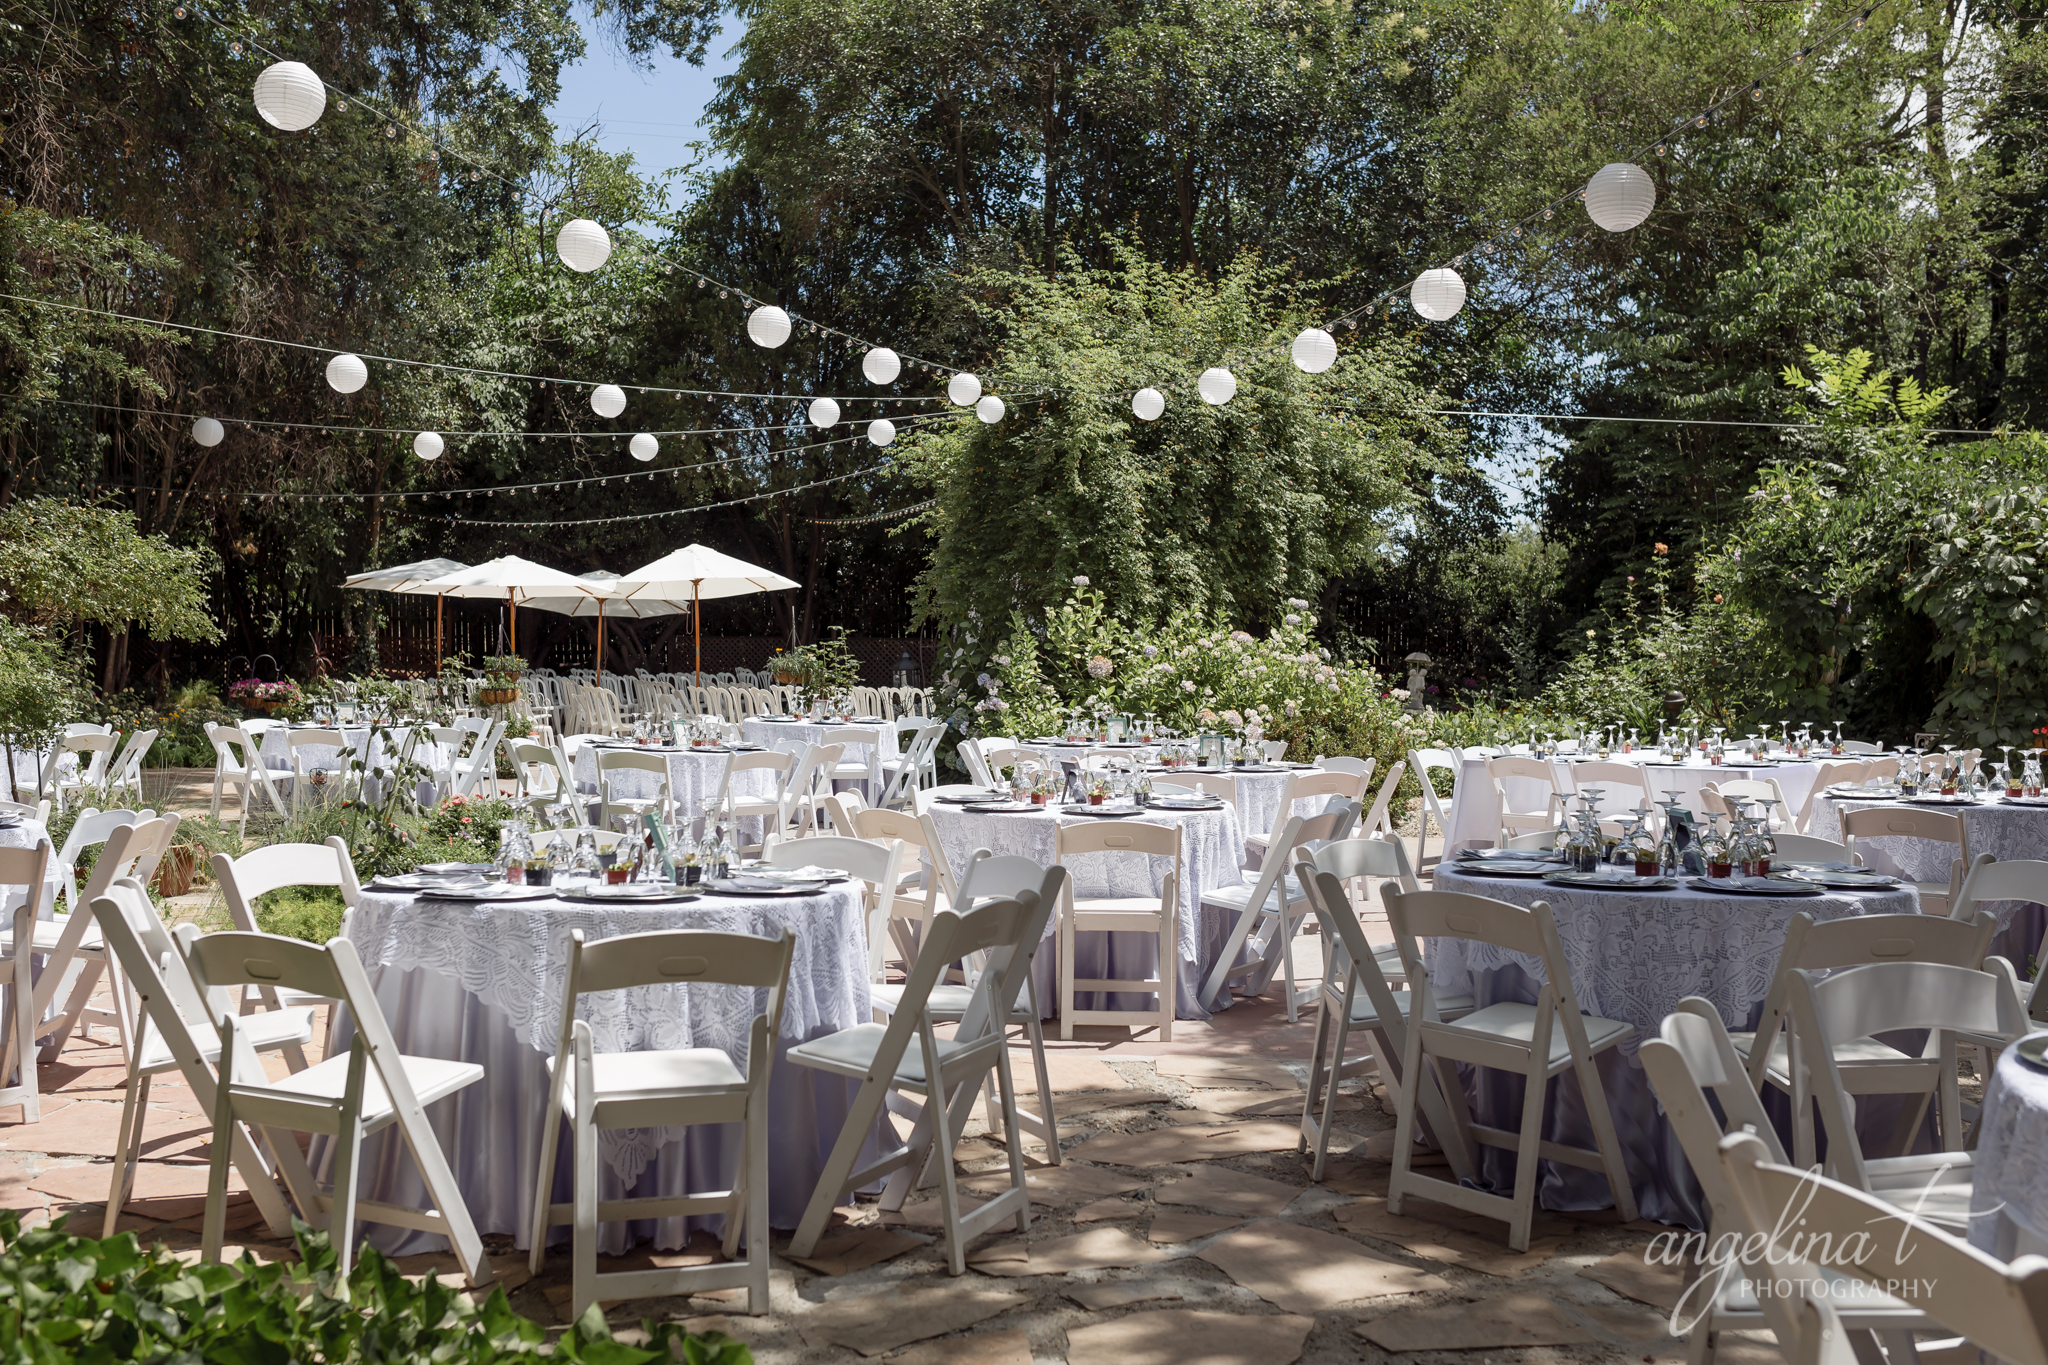 Heirloom-Inn-Garden-Wedding-Photography-Ione-04.JPG